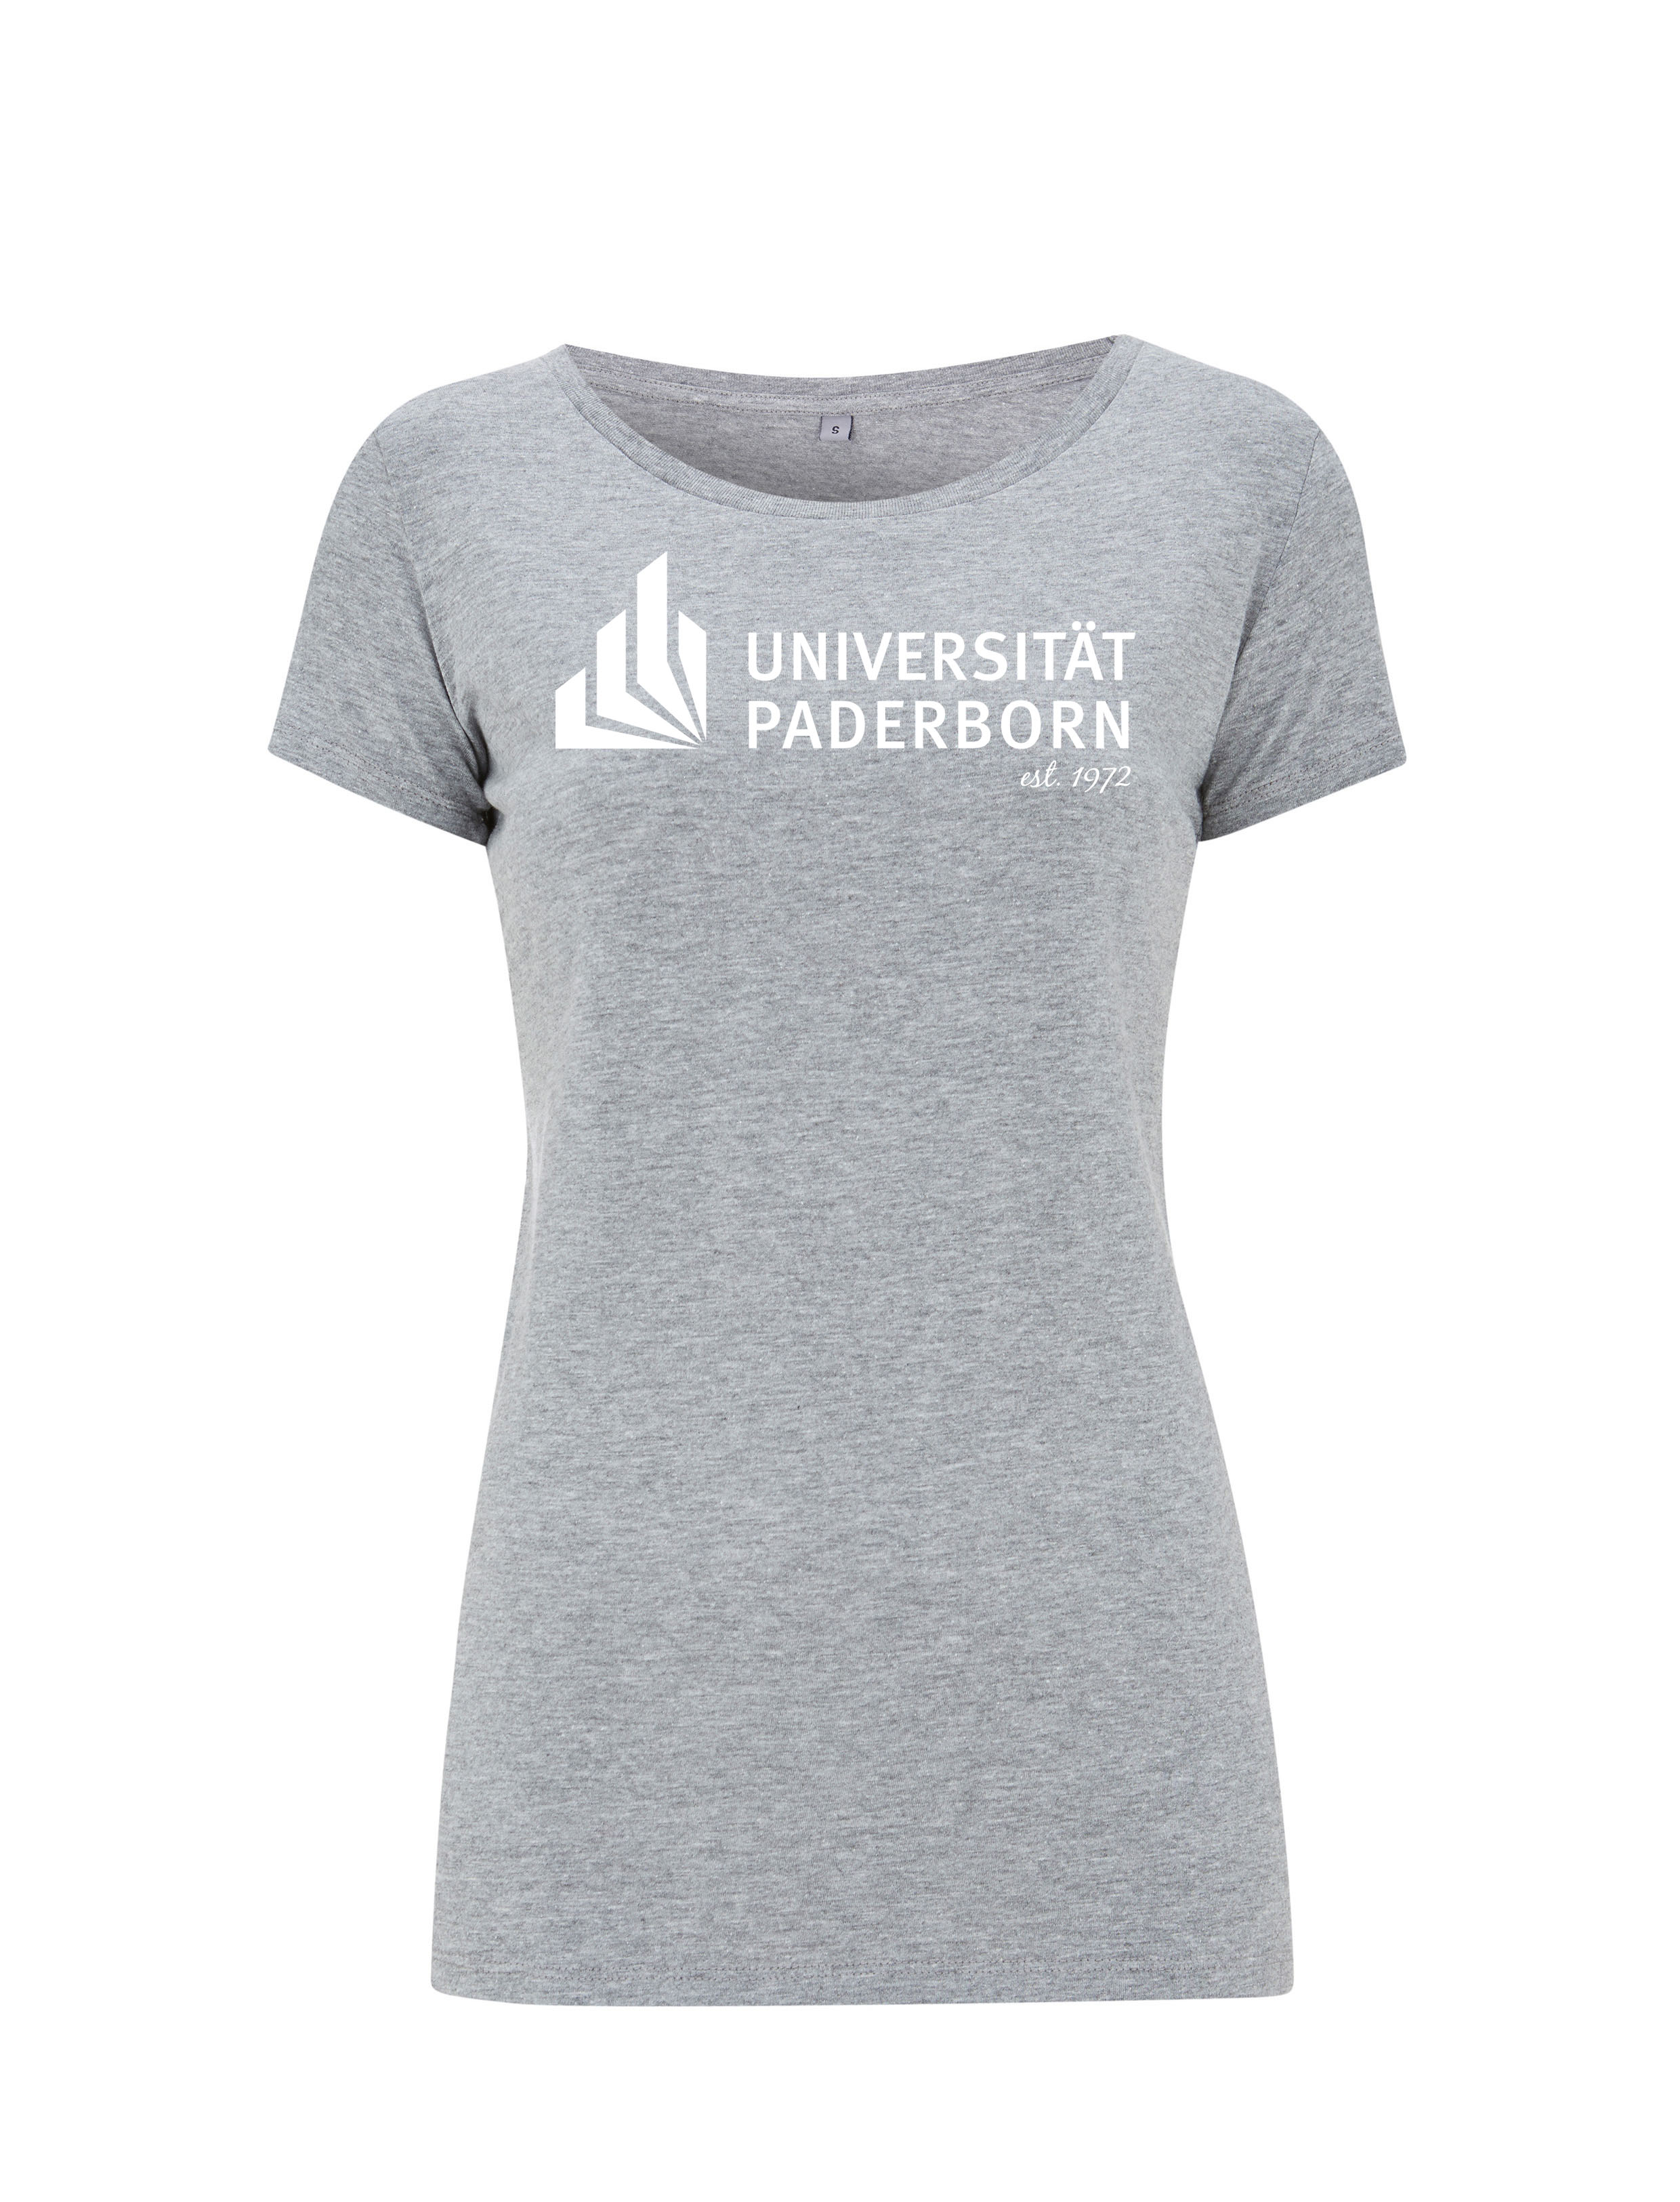 Damen T Shirt Melange Grey